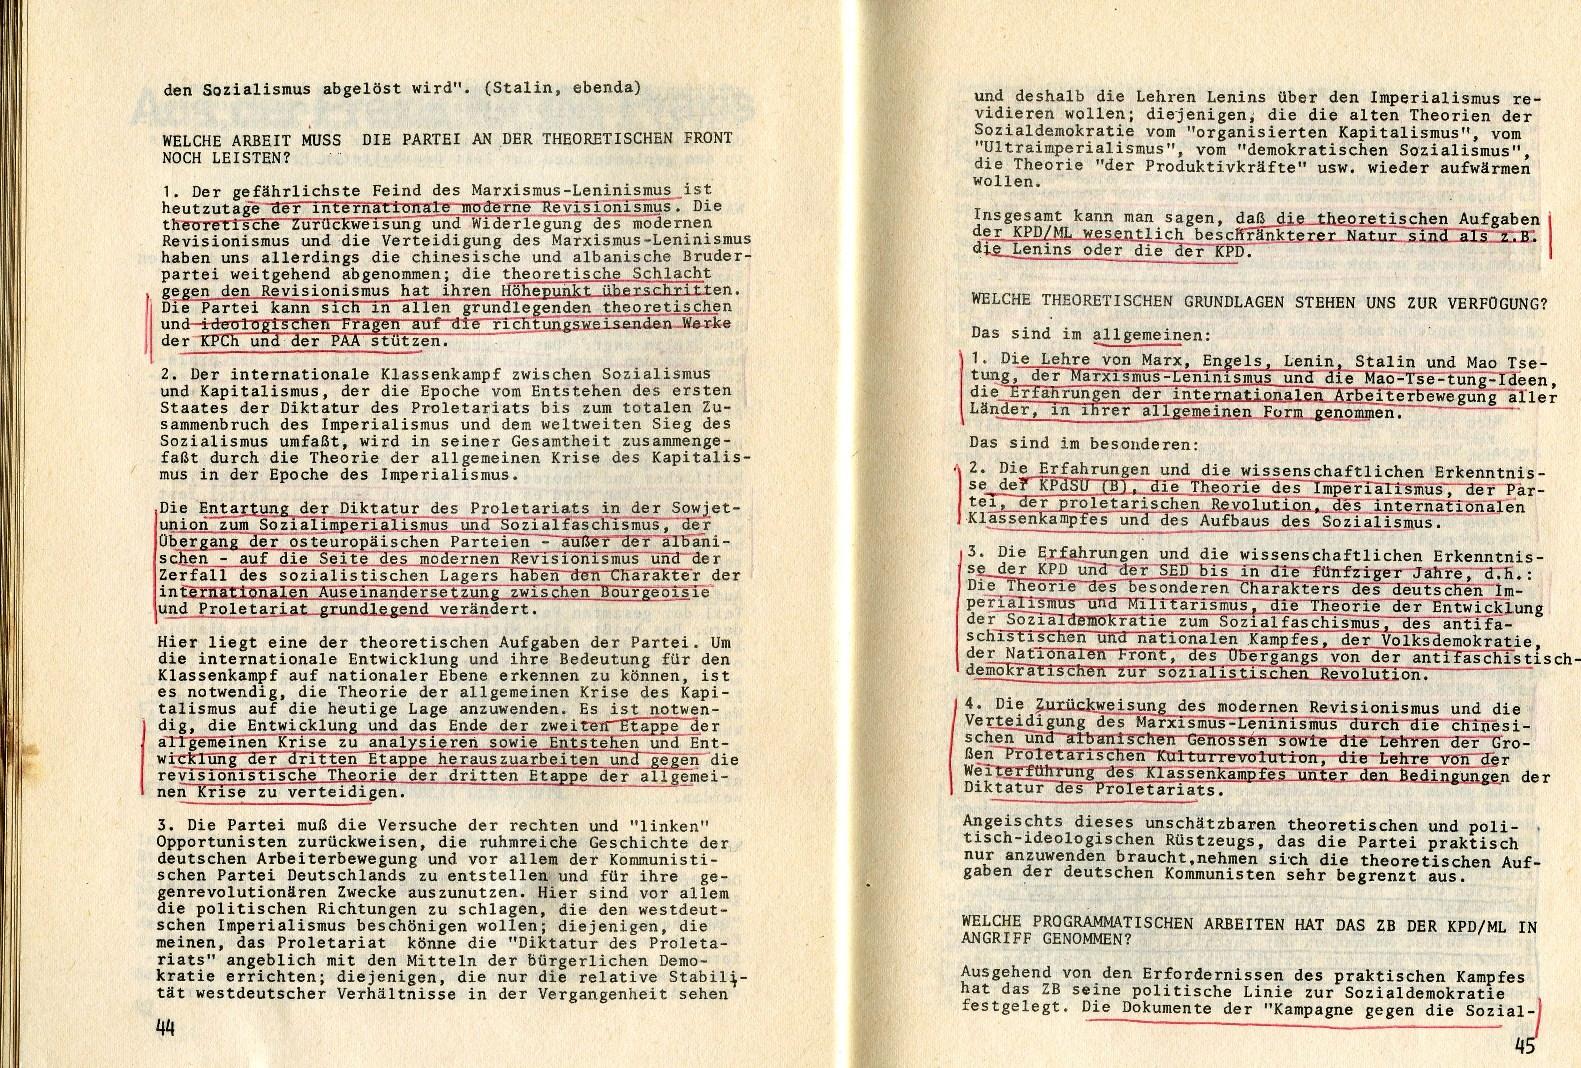 ZB_Parteiarbeiter_1971_05_24